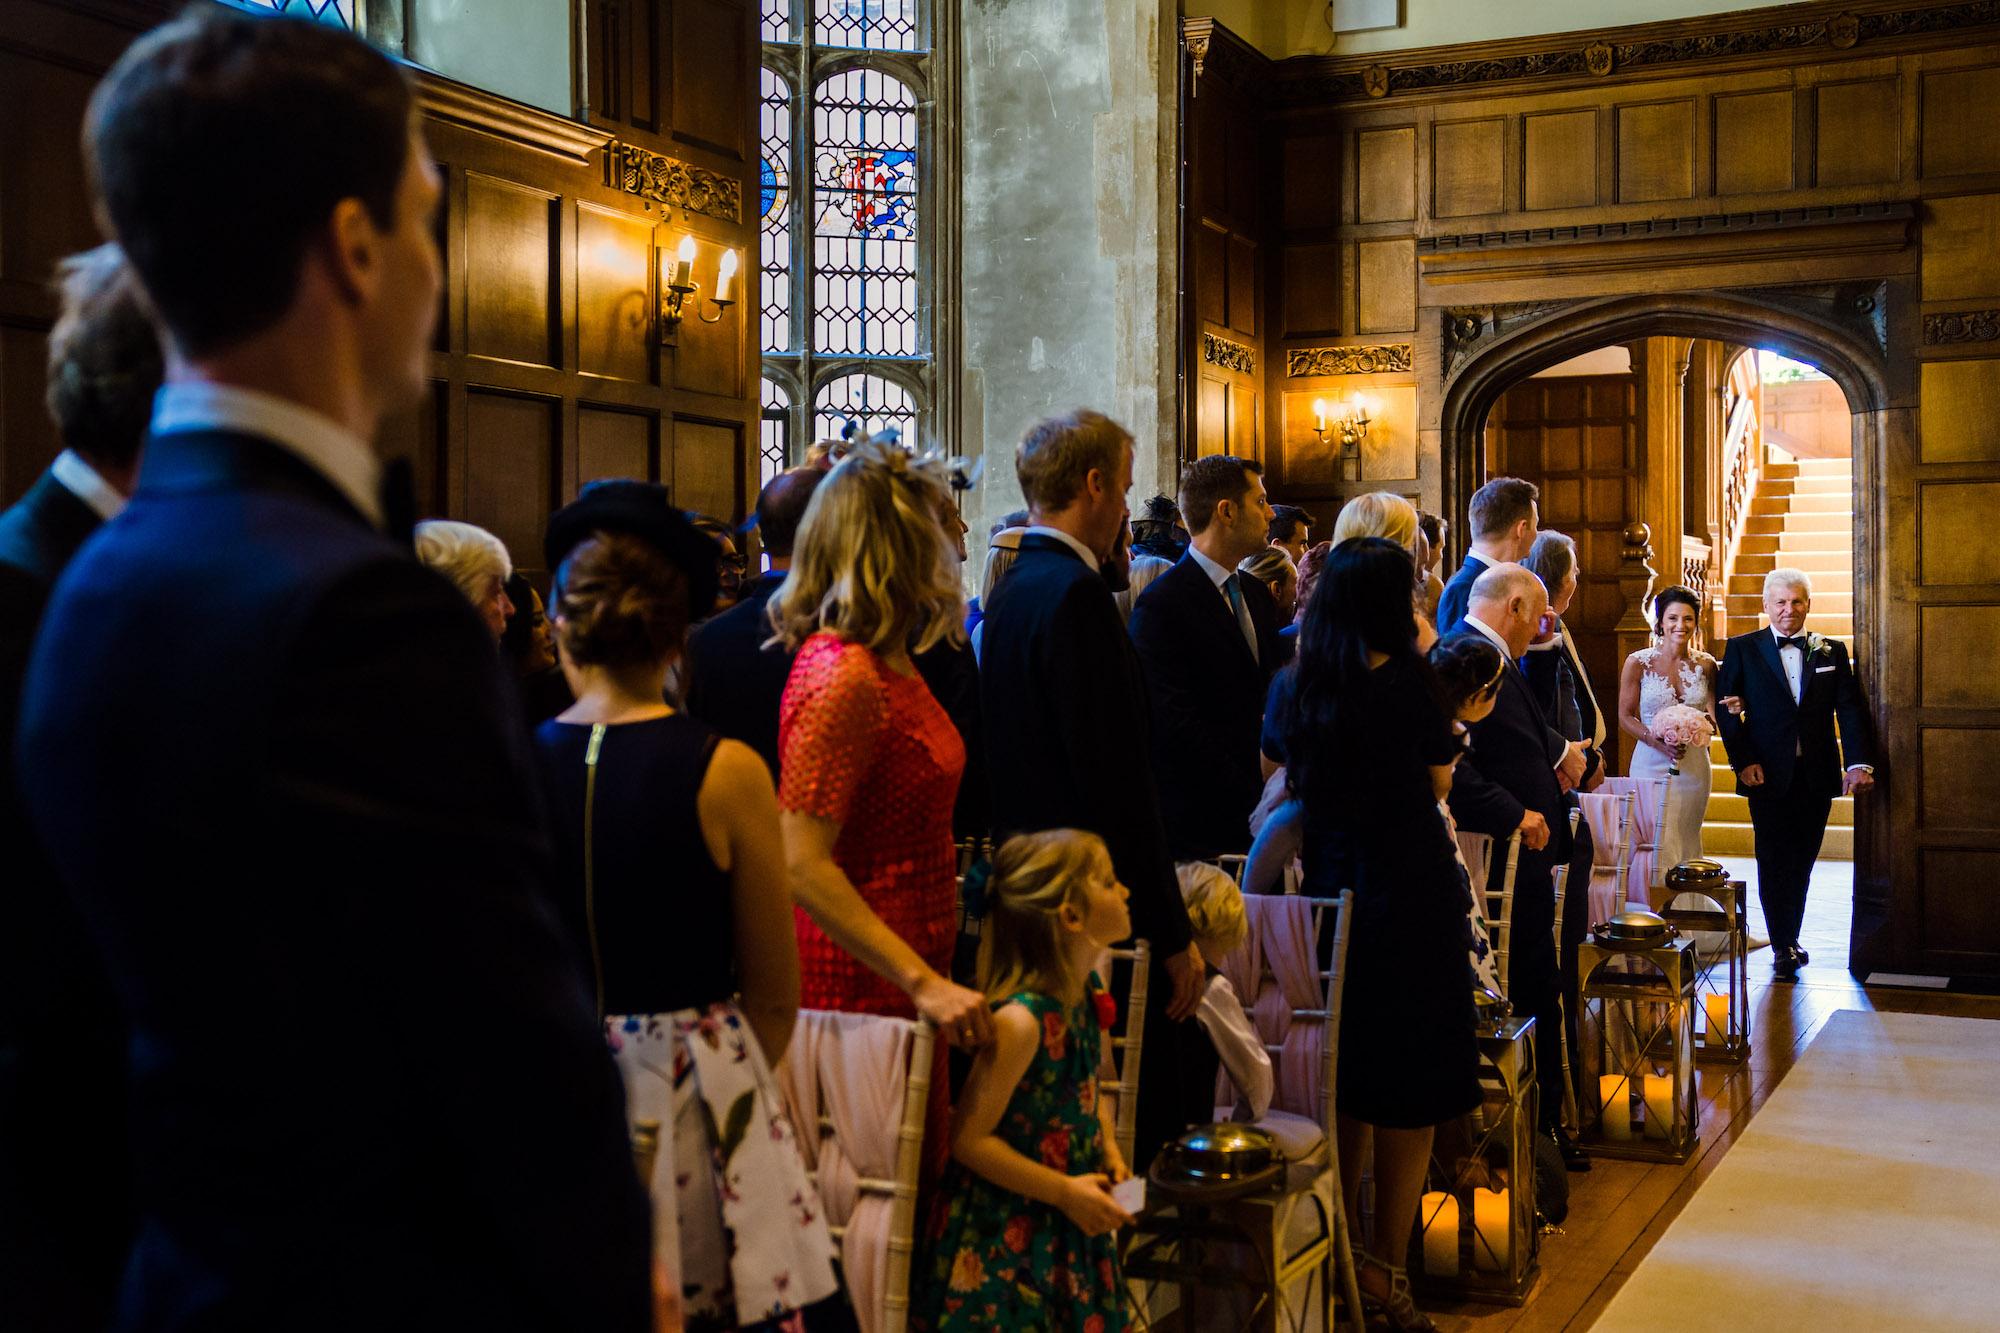 35   Hengrave Hall Wedding   Suffolk Wedding   Lamare London   Luxury Wedding Planner   Jon Mold Photography.jpg